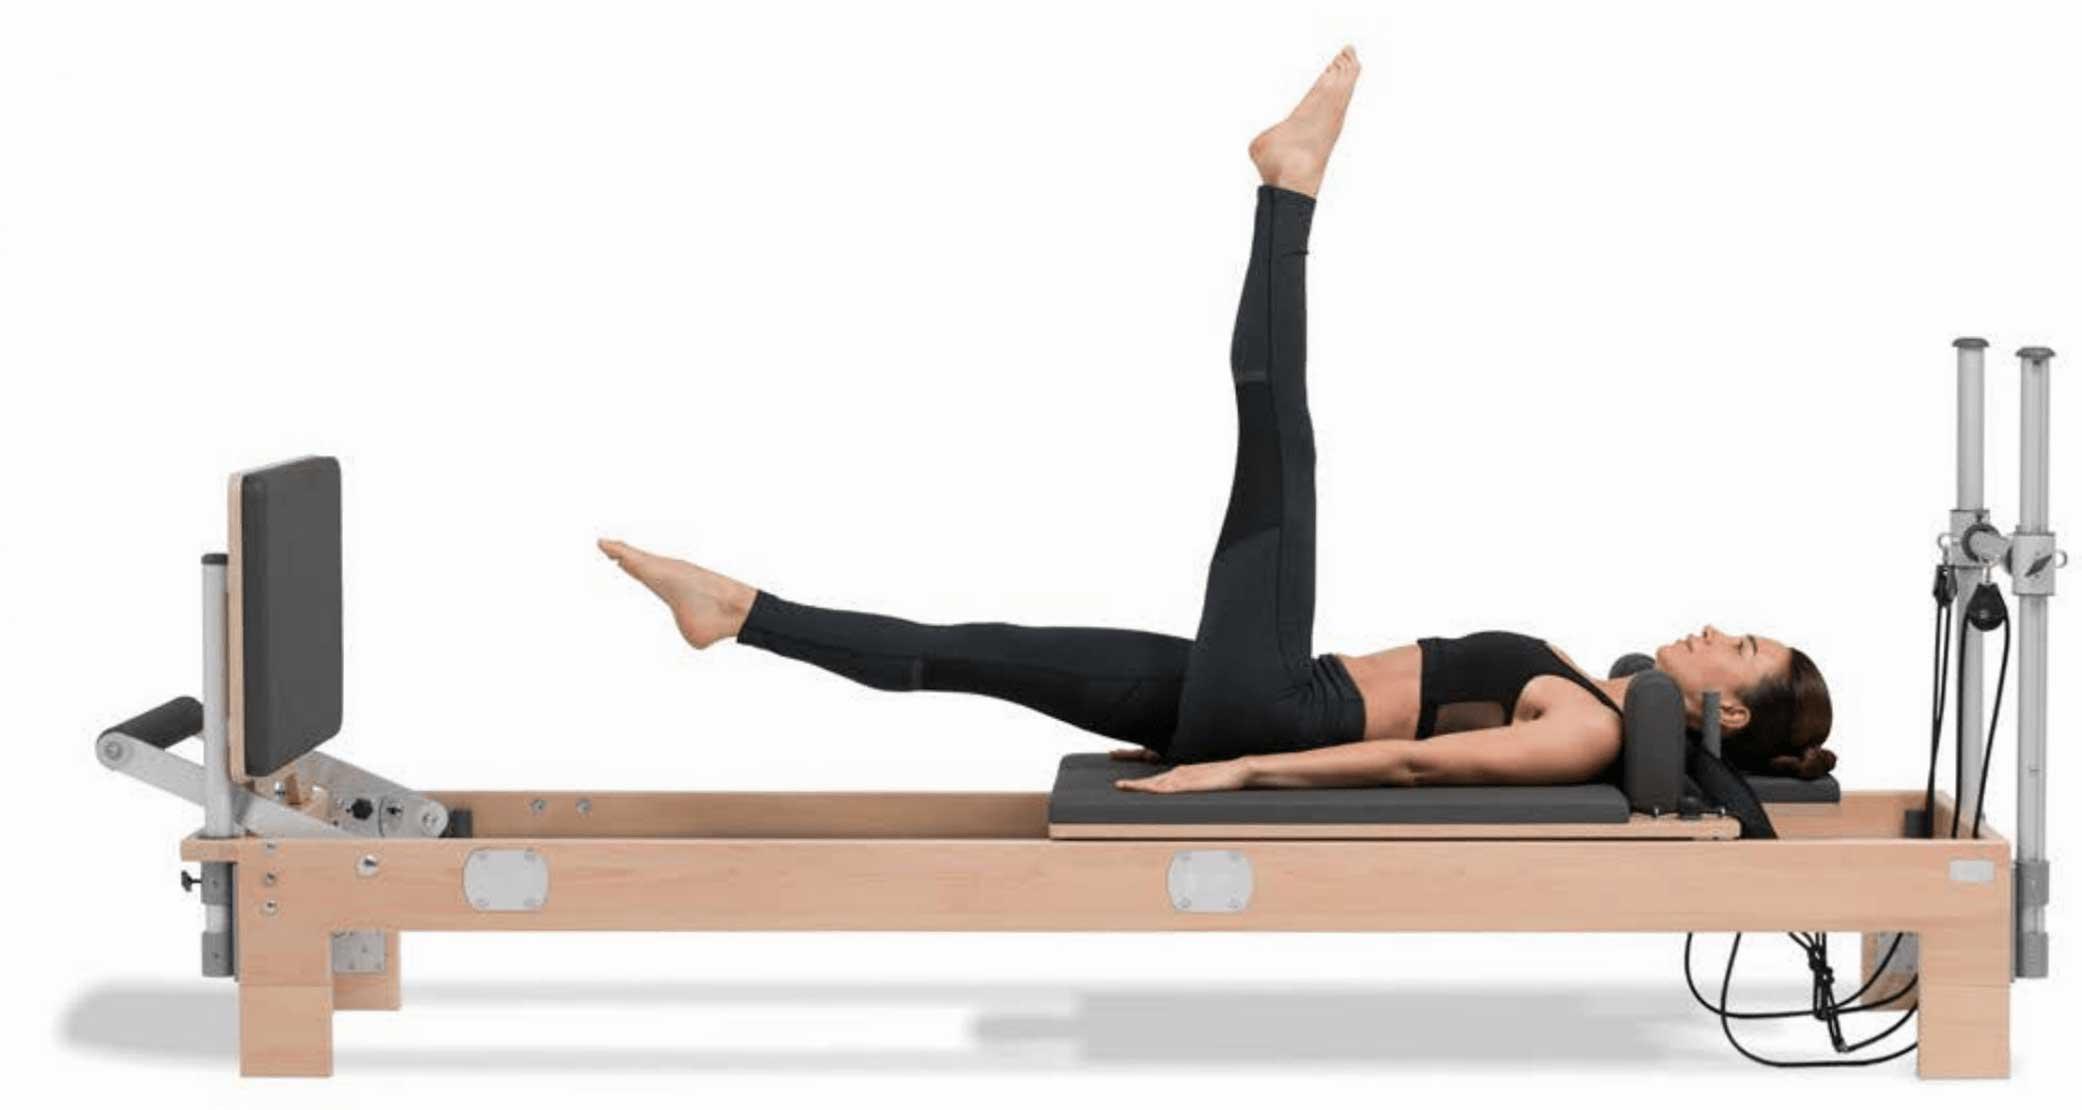 Dynamic Pilates Reformer Fit Jumpboard Class